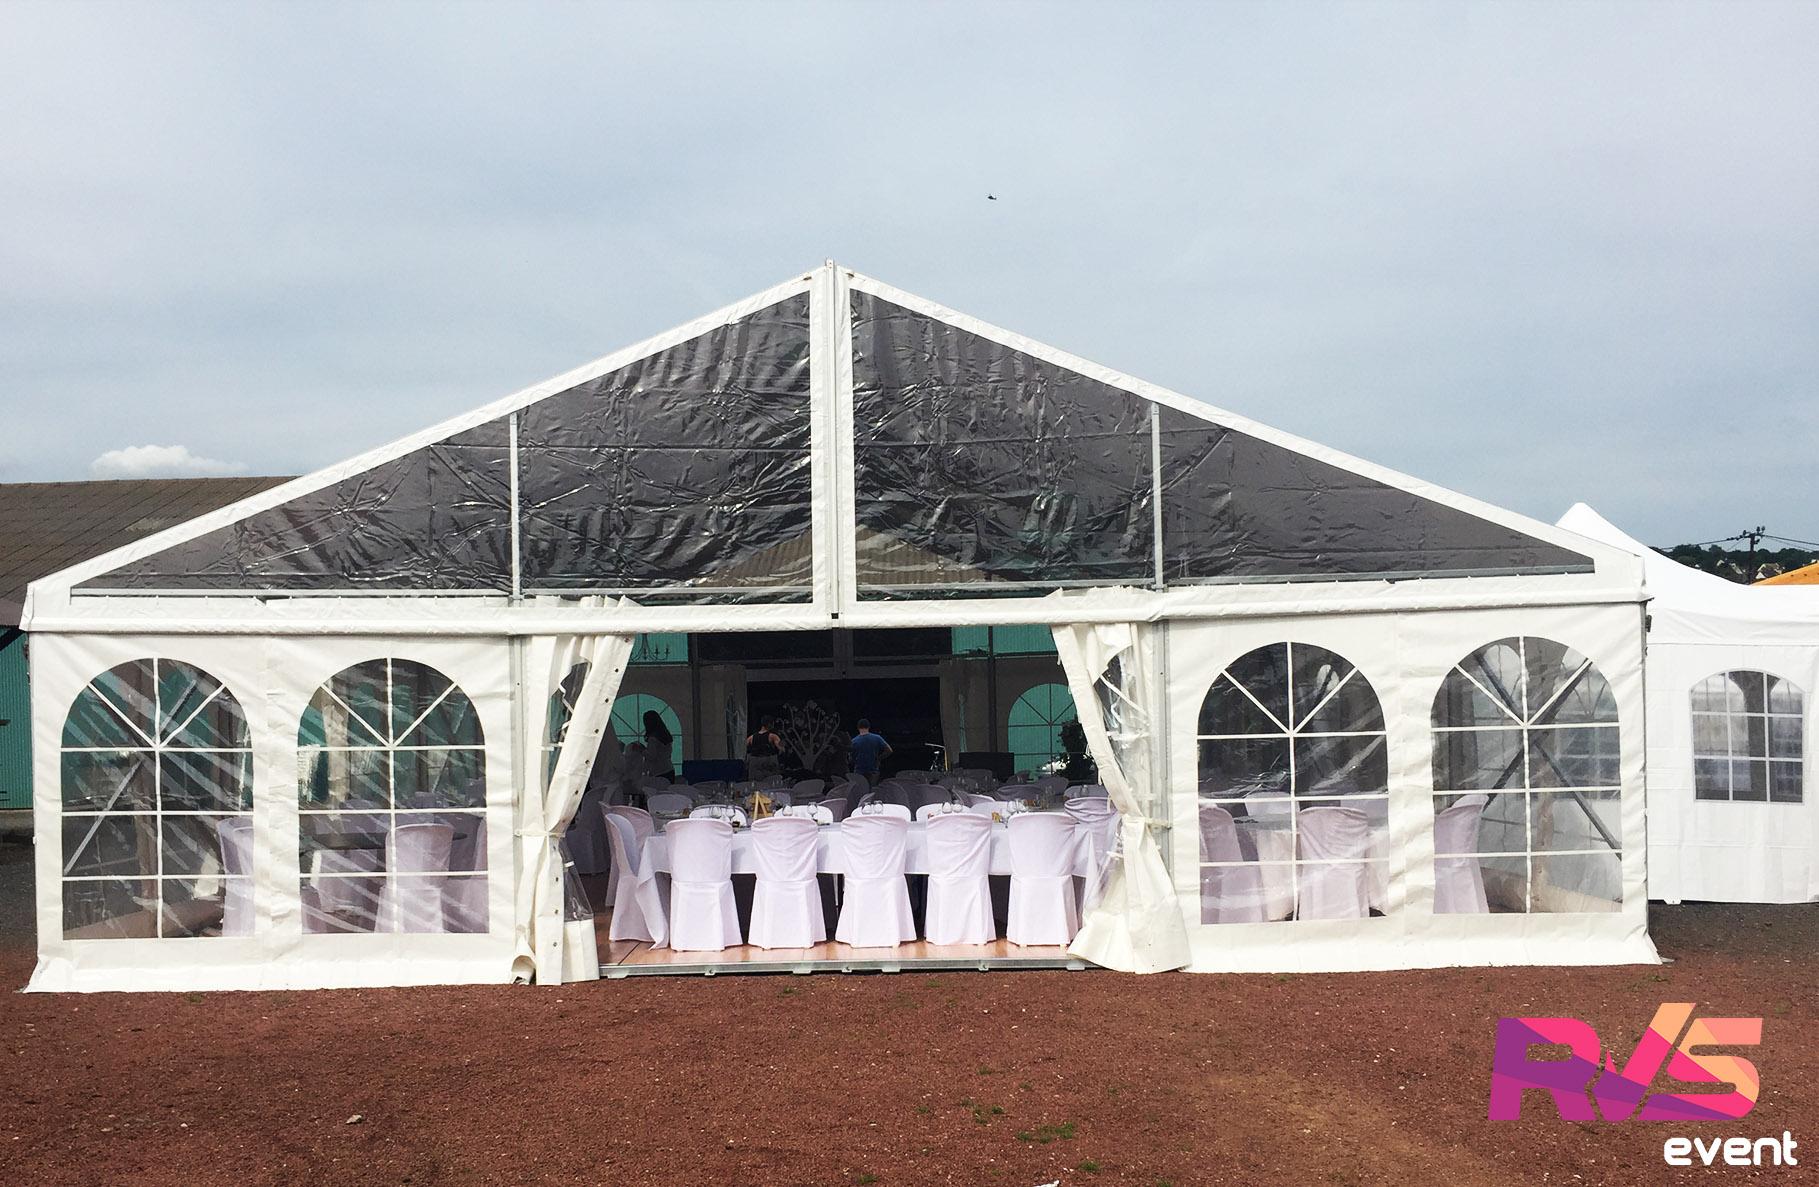 mariage tente de r ception opaque 10x12 rvs event. Black Bedroom Furniture Sets. Home Design Ideas